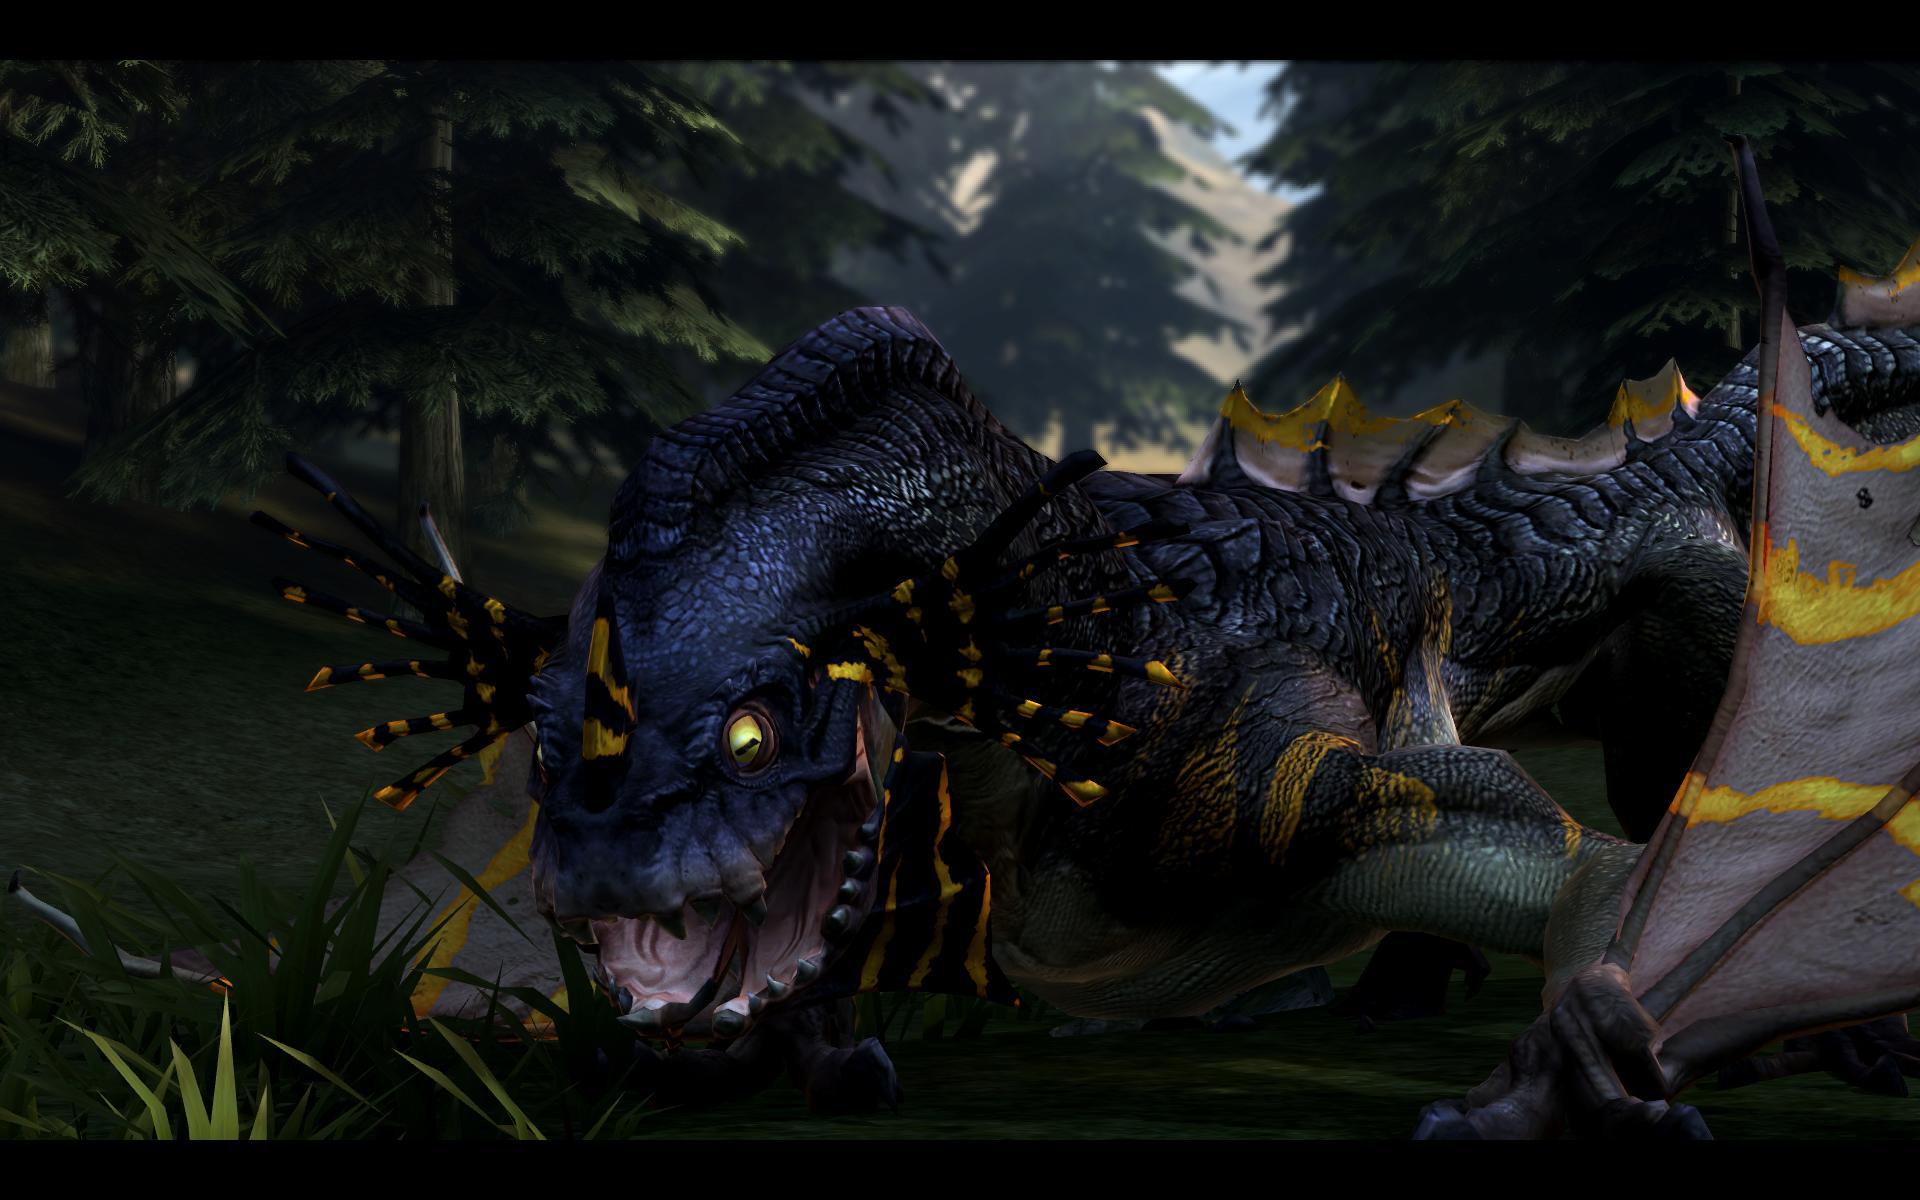 dragonage2-2011-10-22-12-26-28-85